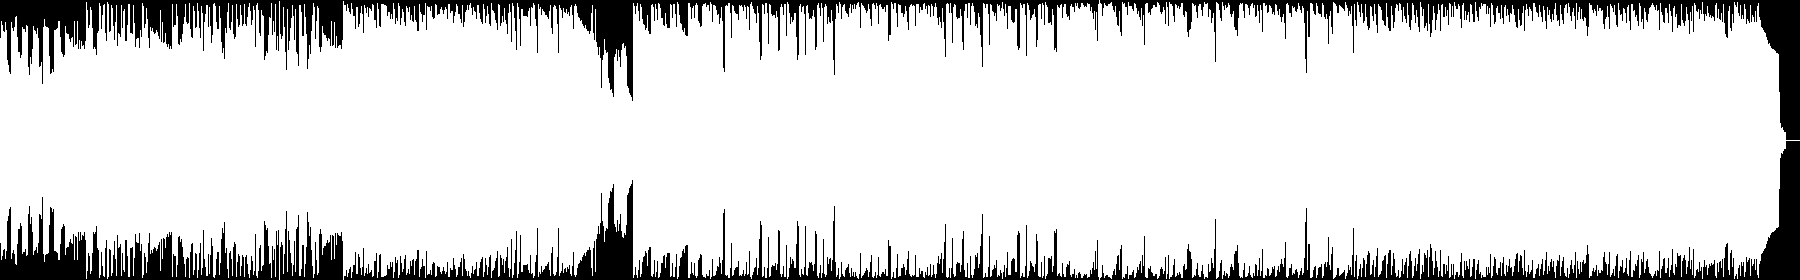 RnB Guitar audio waveform